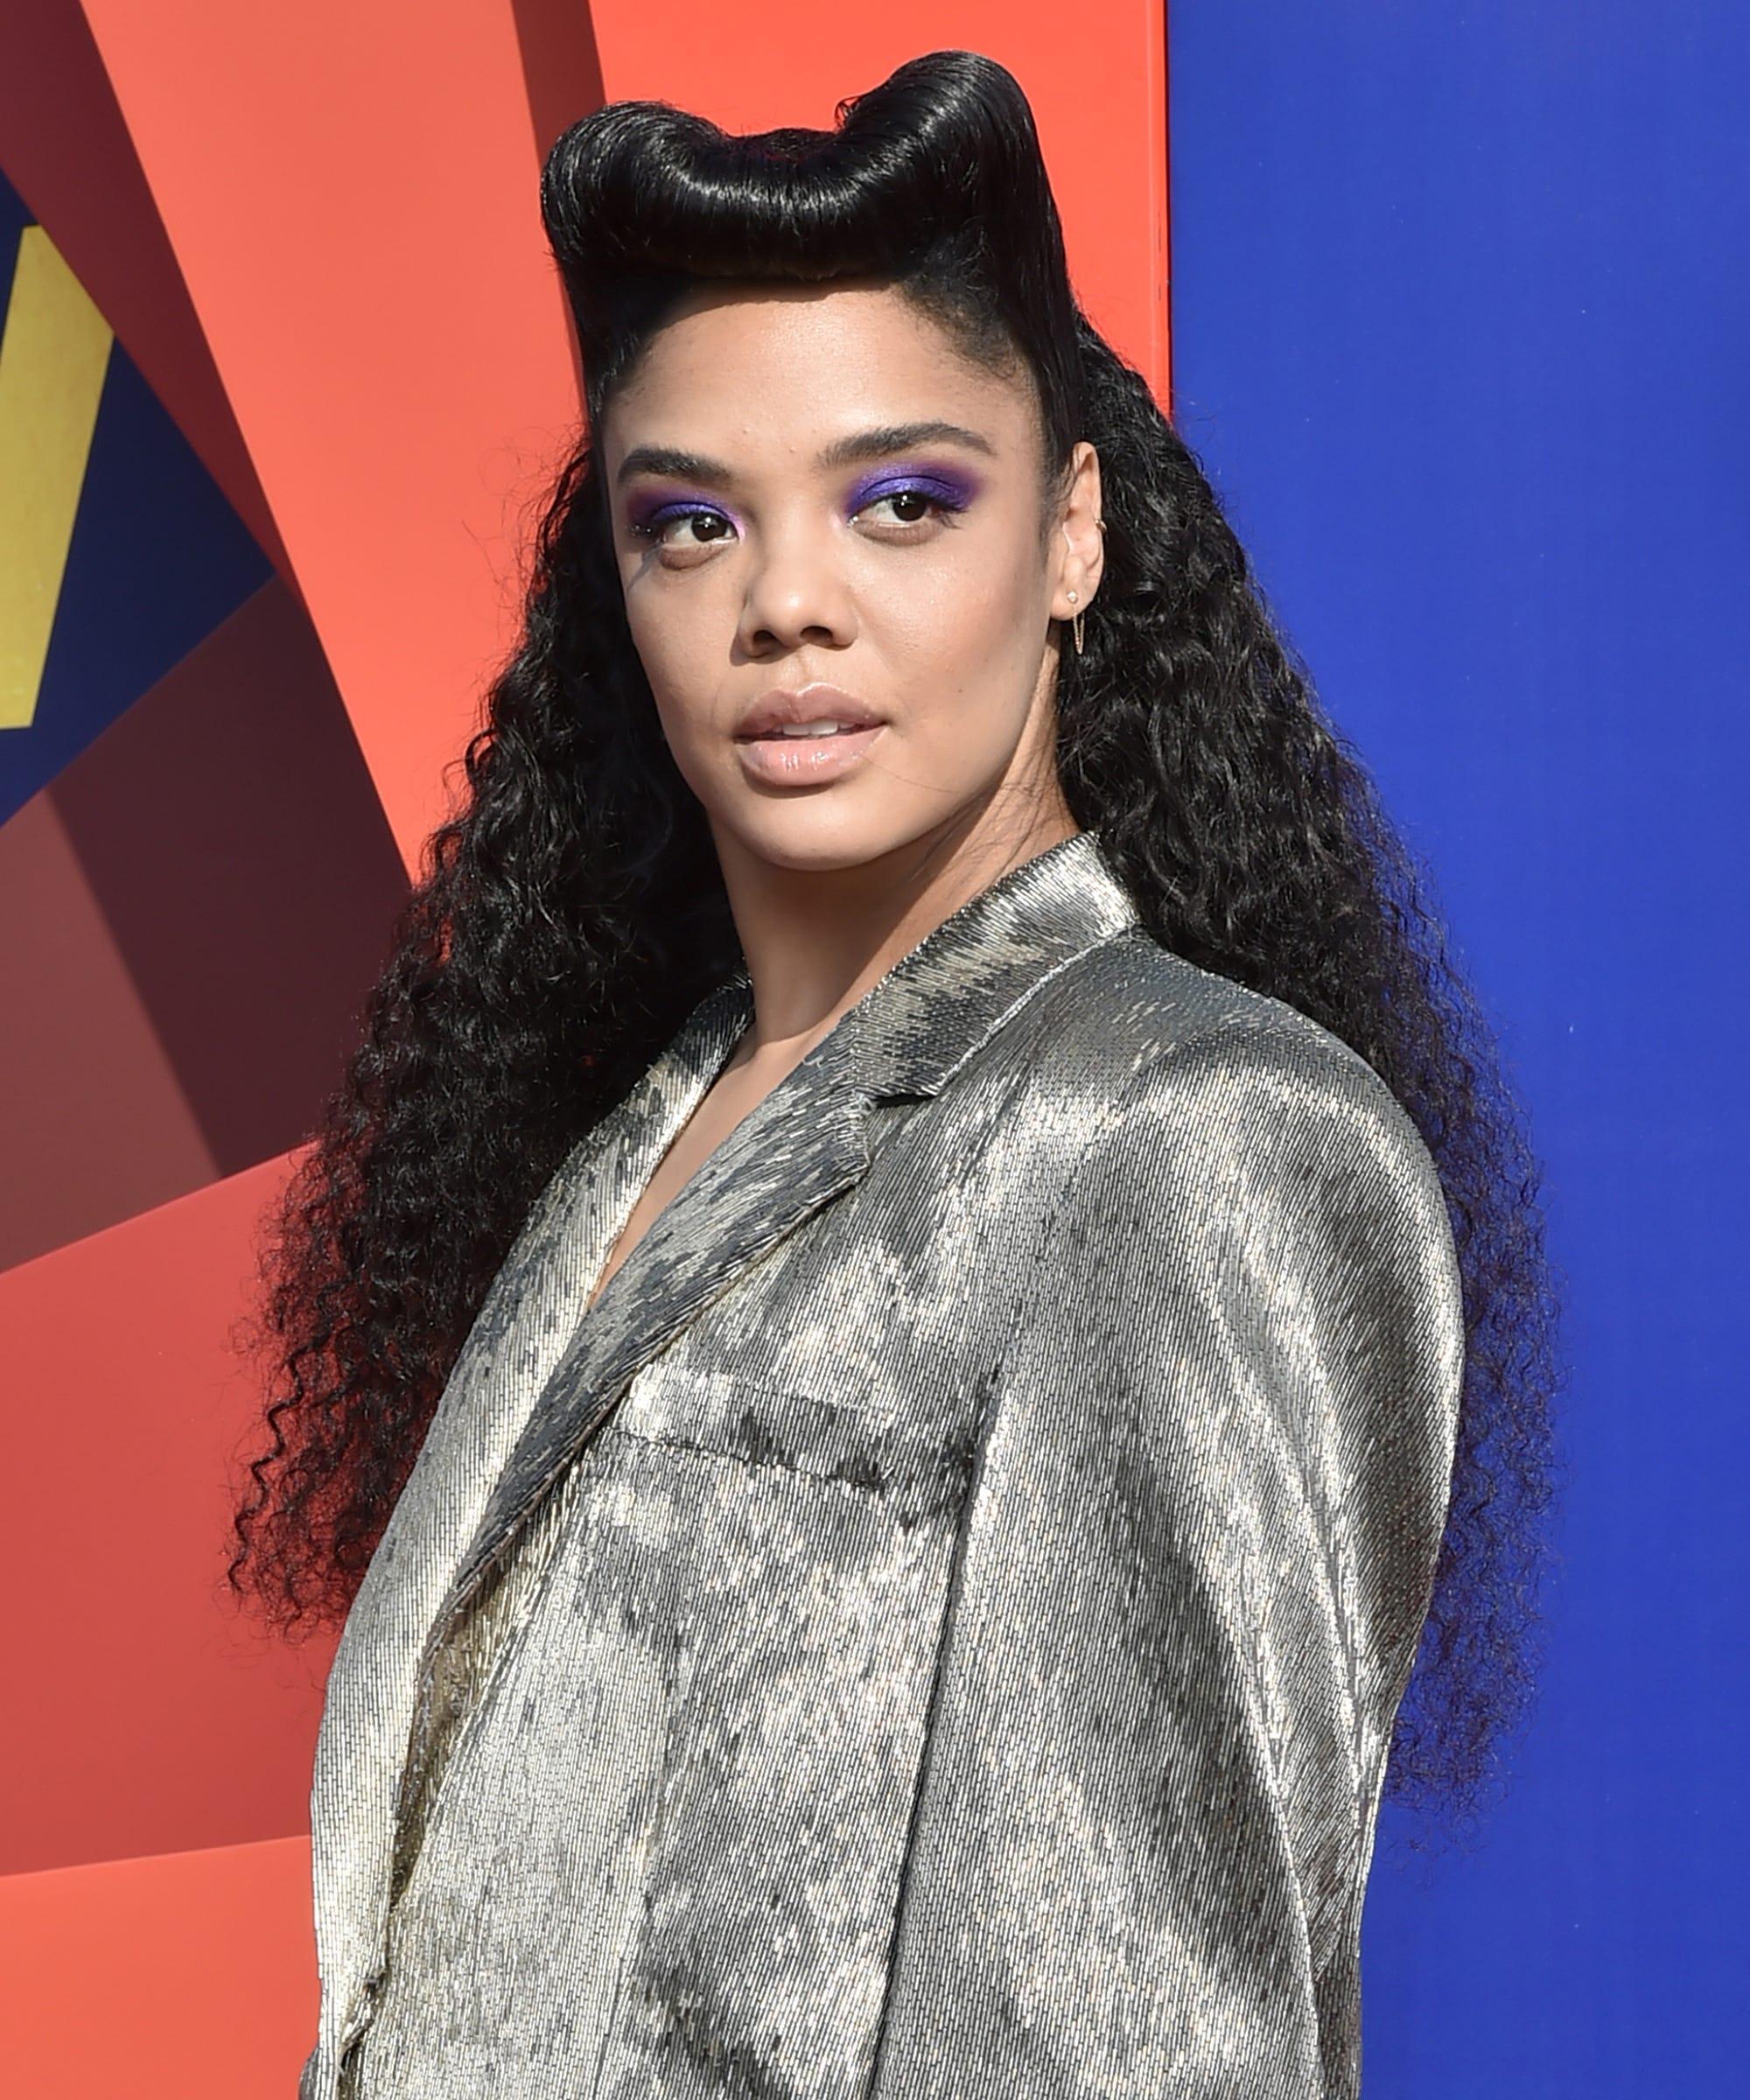 Tessa Thompson's MTV Movie & TV Awards Hairdo Is All About Girl Power